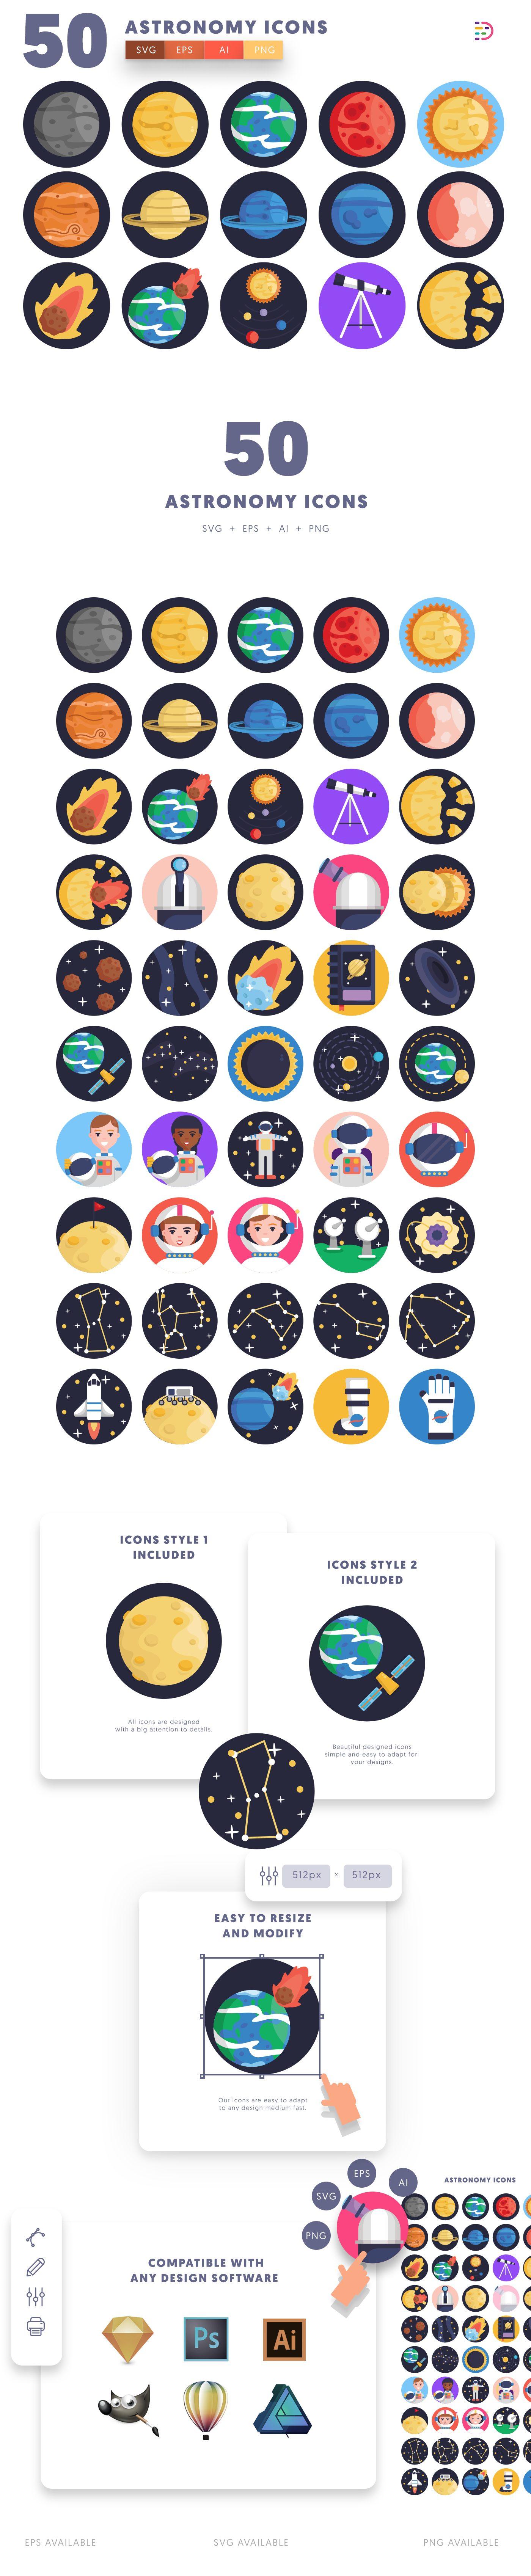 Astronomy icons info graphic